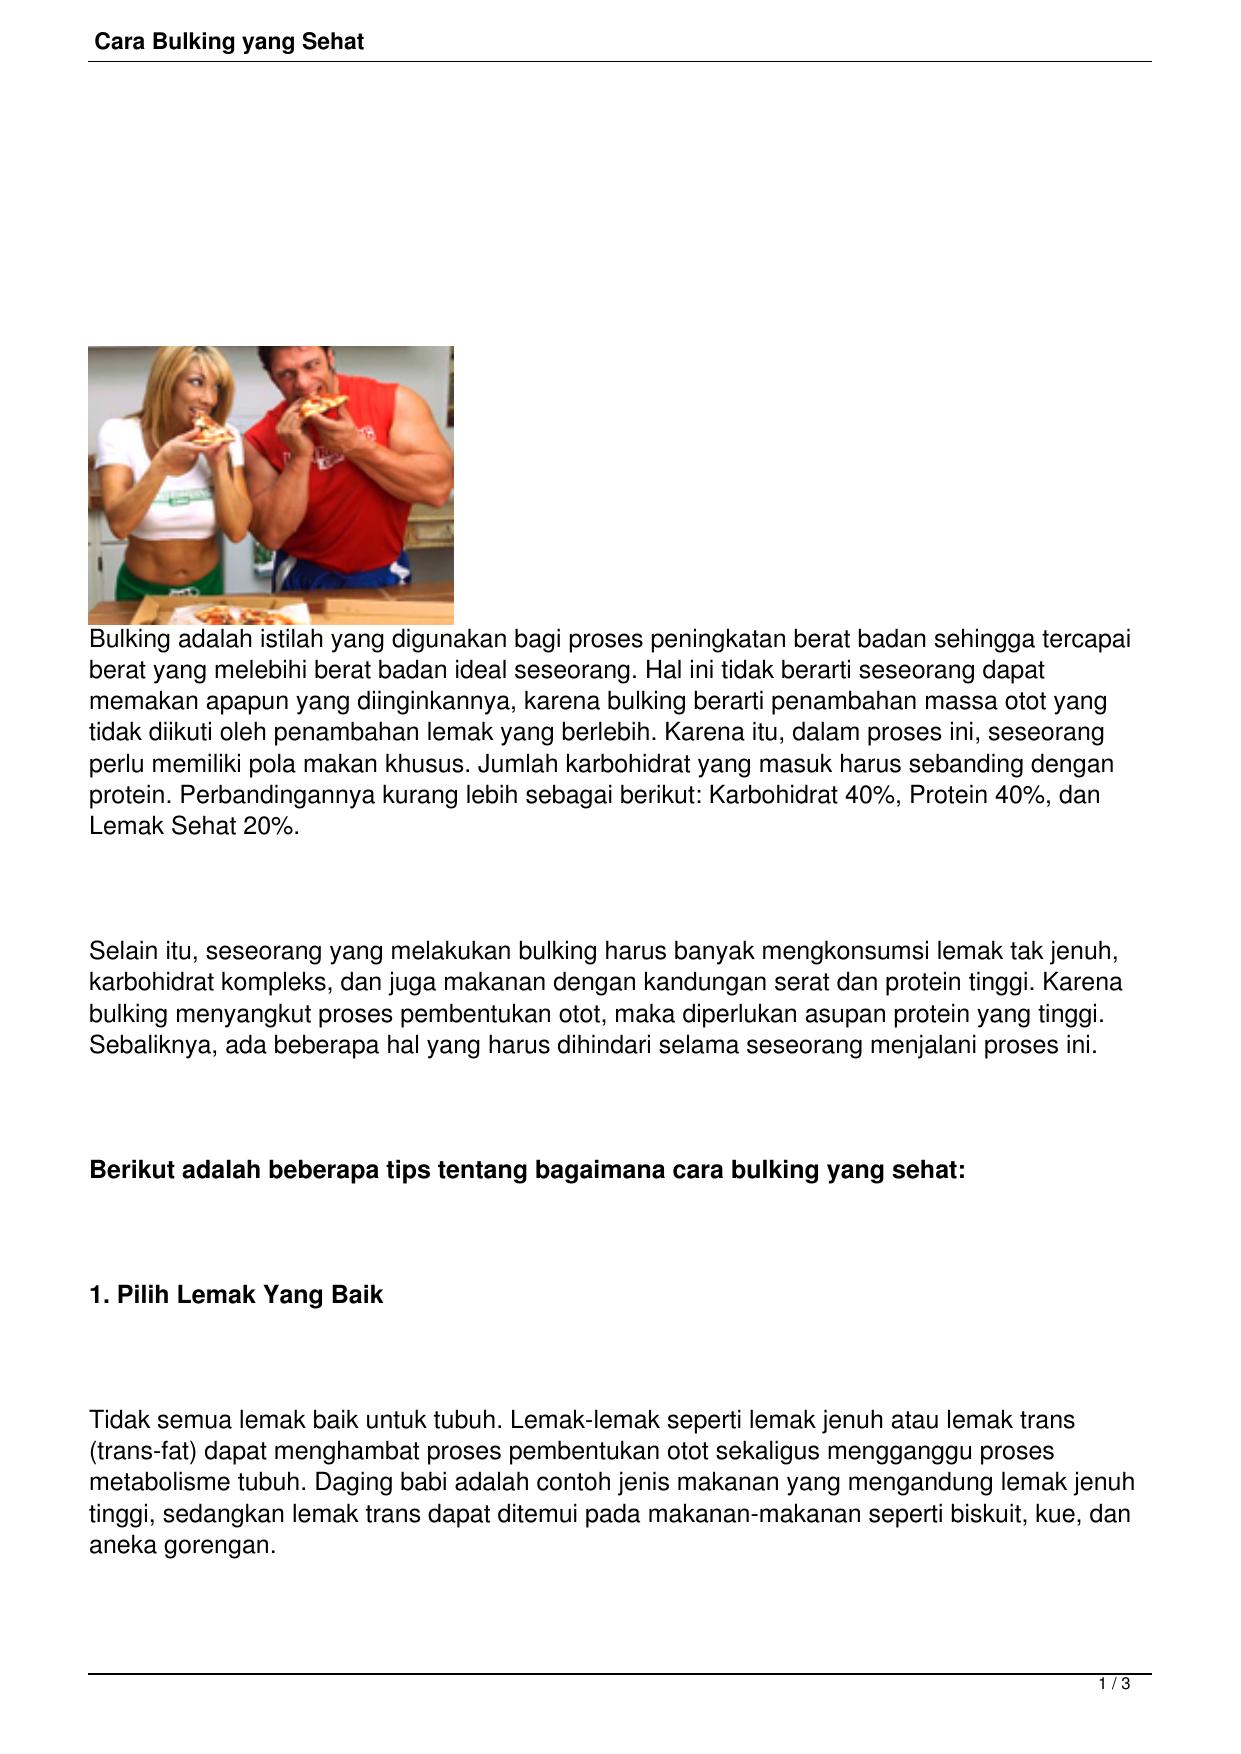 Cara Bulking Yang Sehat